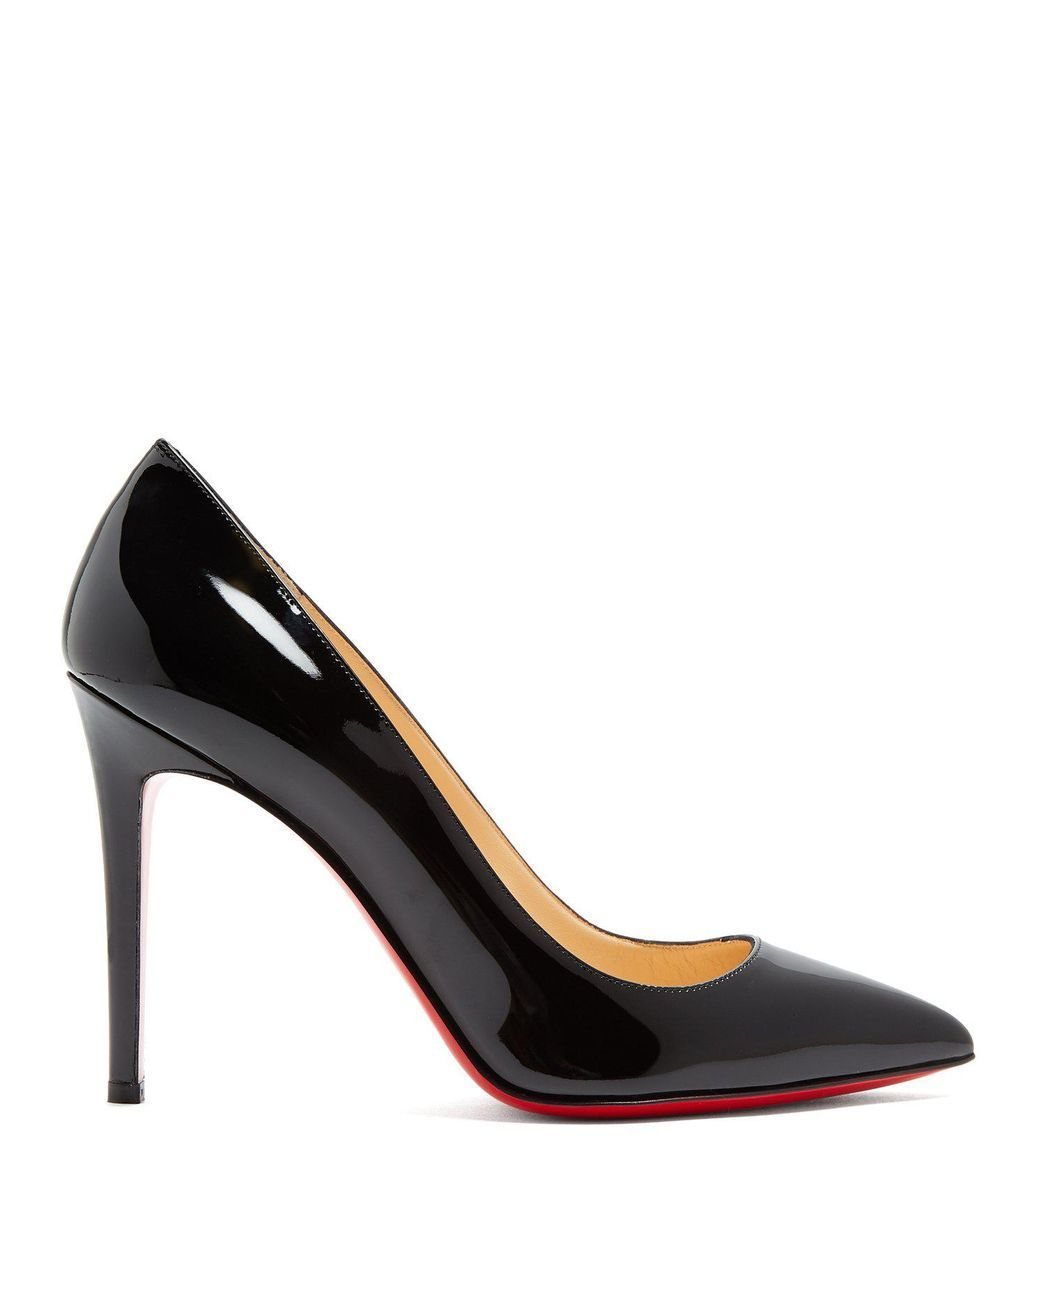 d0d7557bff24 Christian Louboutin - Black Pigalle 100mm Patent-leather Pumps - Lyst